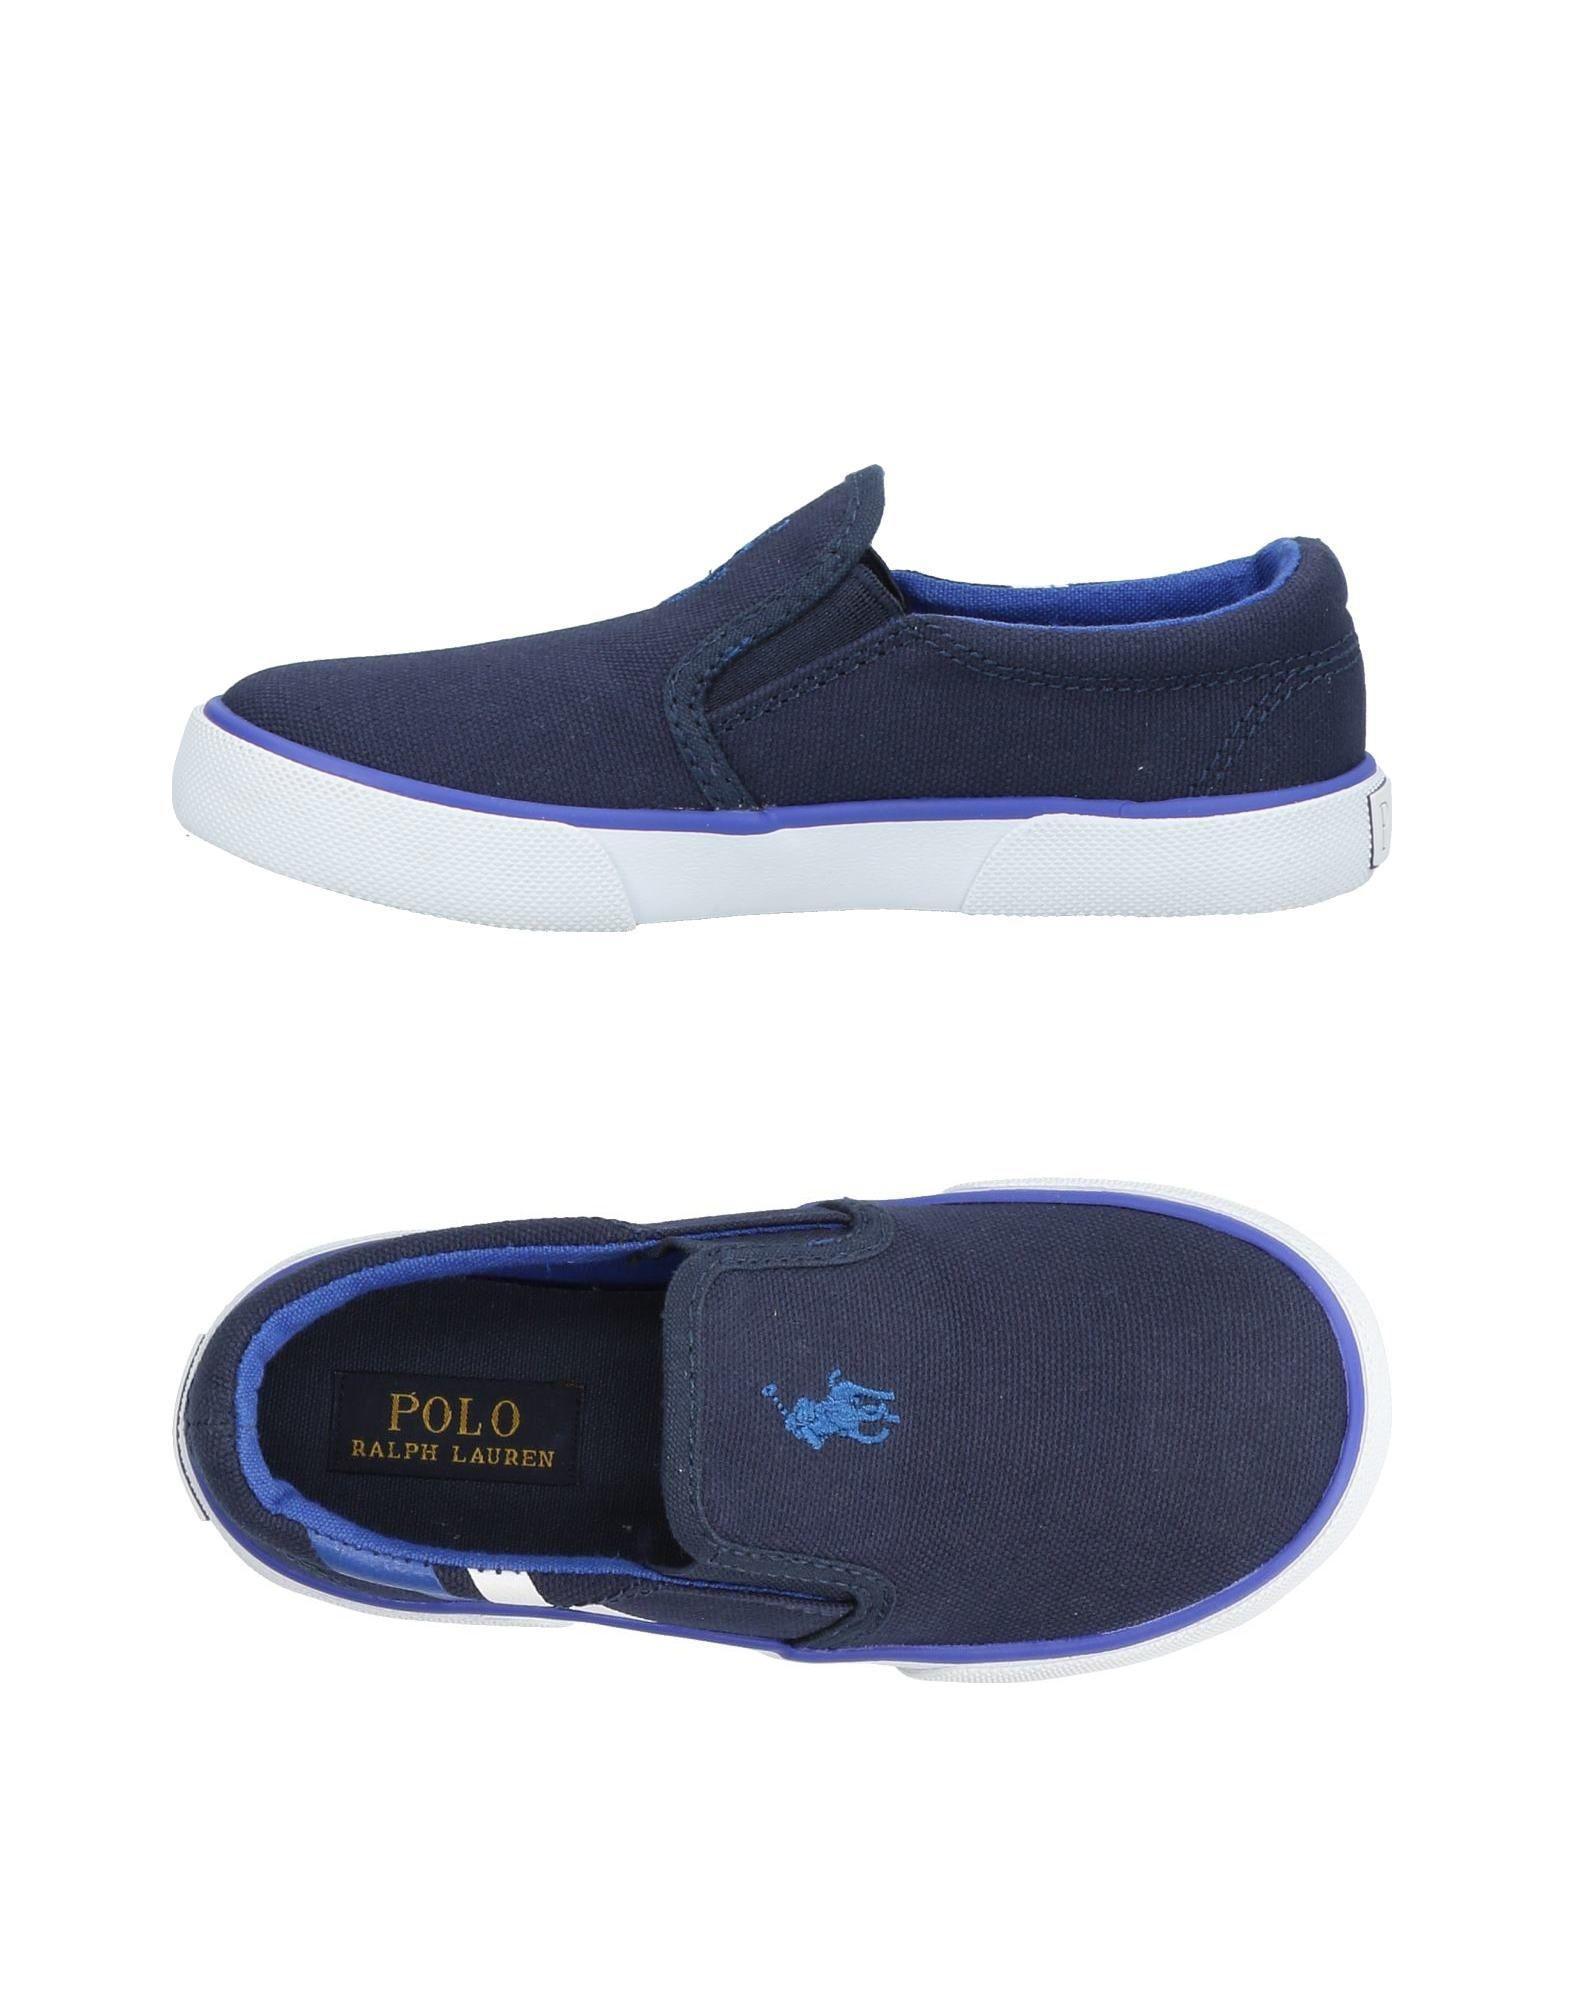 a5444e9918357 Lyst - Ralph Lauren Low-tops   Sneakers in Blue for Men